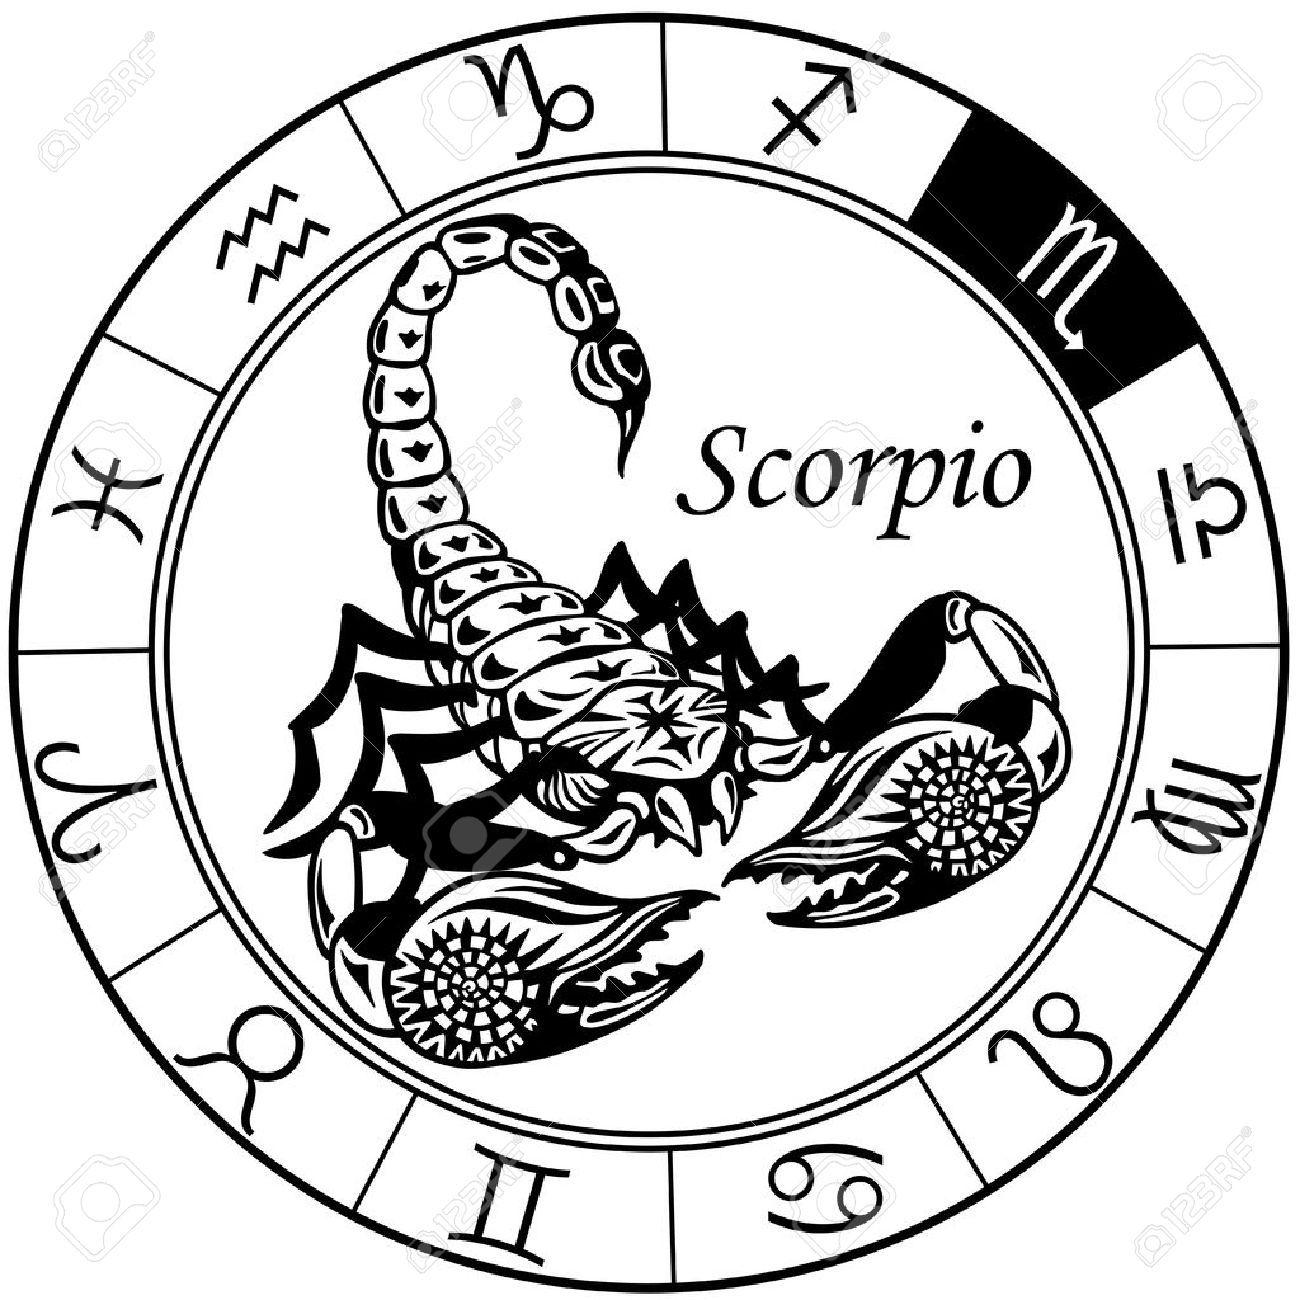 Scorpio astrology clipart image freeuse Stock Vector | poin | Zodiac, Scorpio, Scorpio sun sign image freeuse